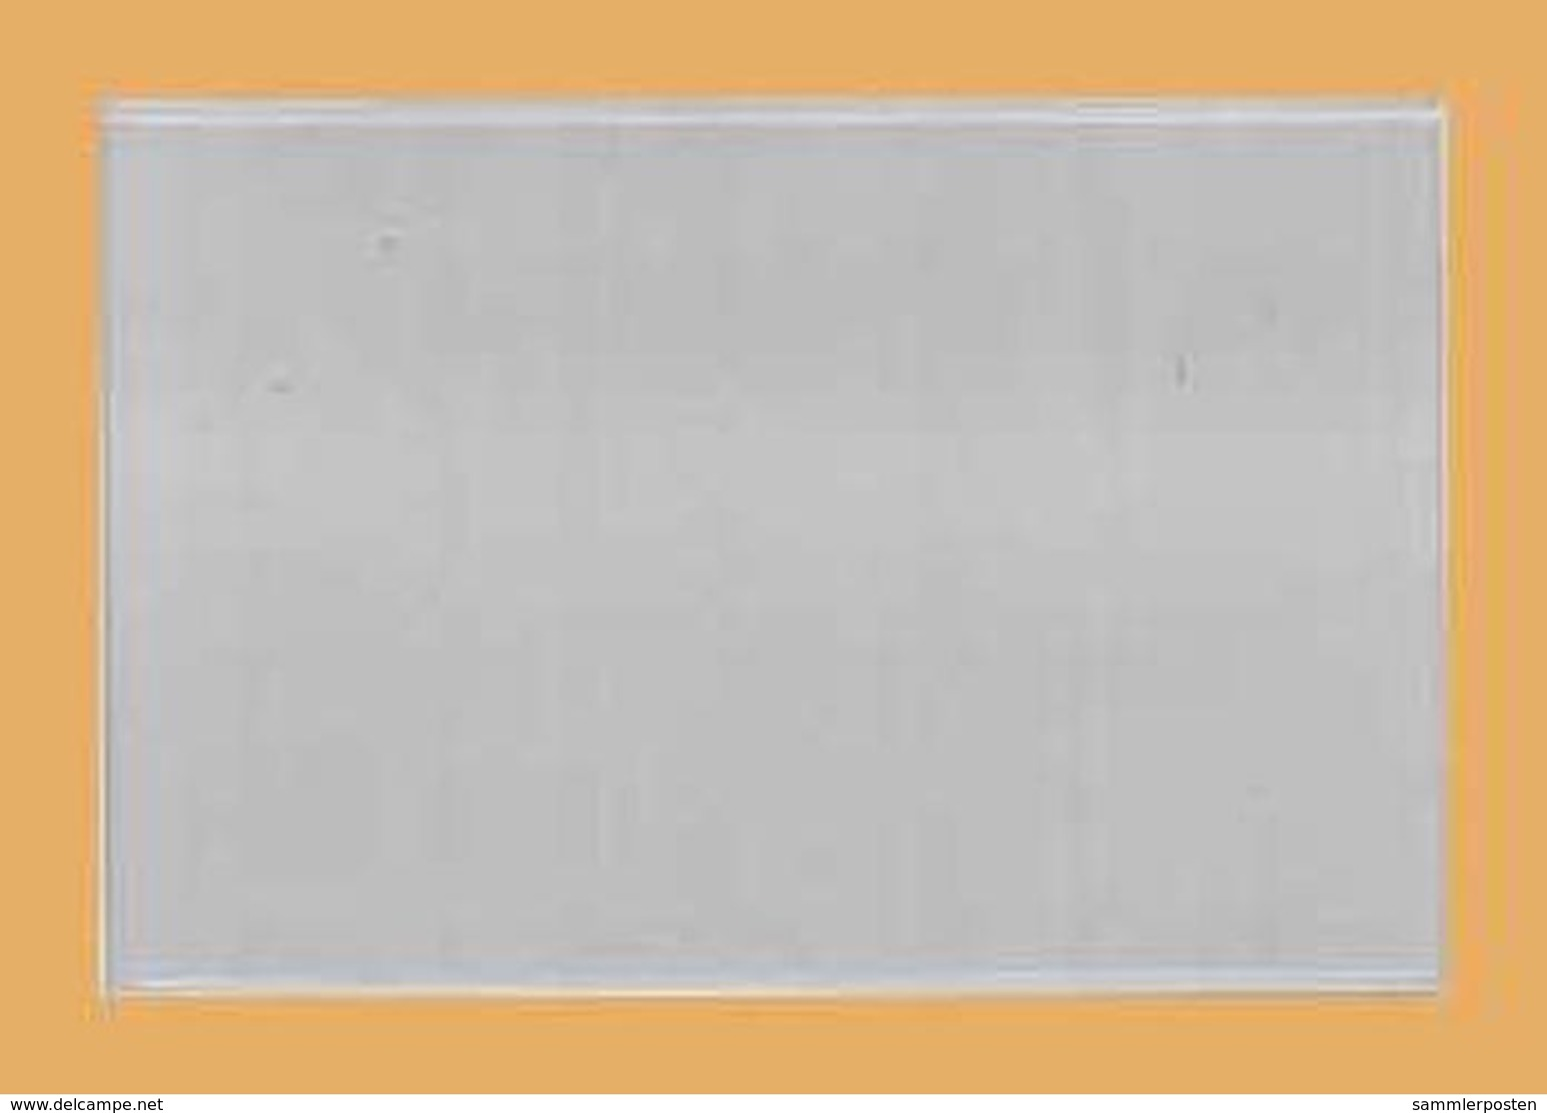 100x KOBRA-Telefonkartenhülle Nr. T71 - Material